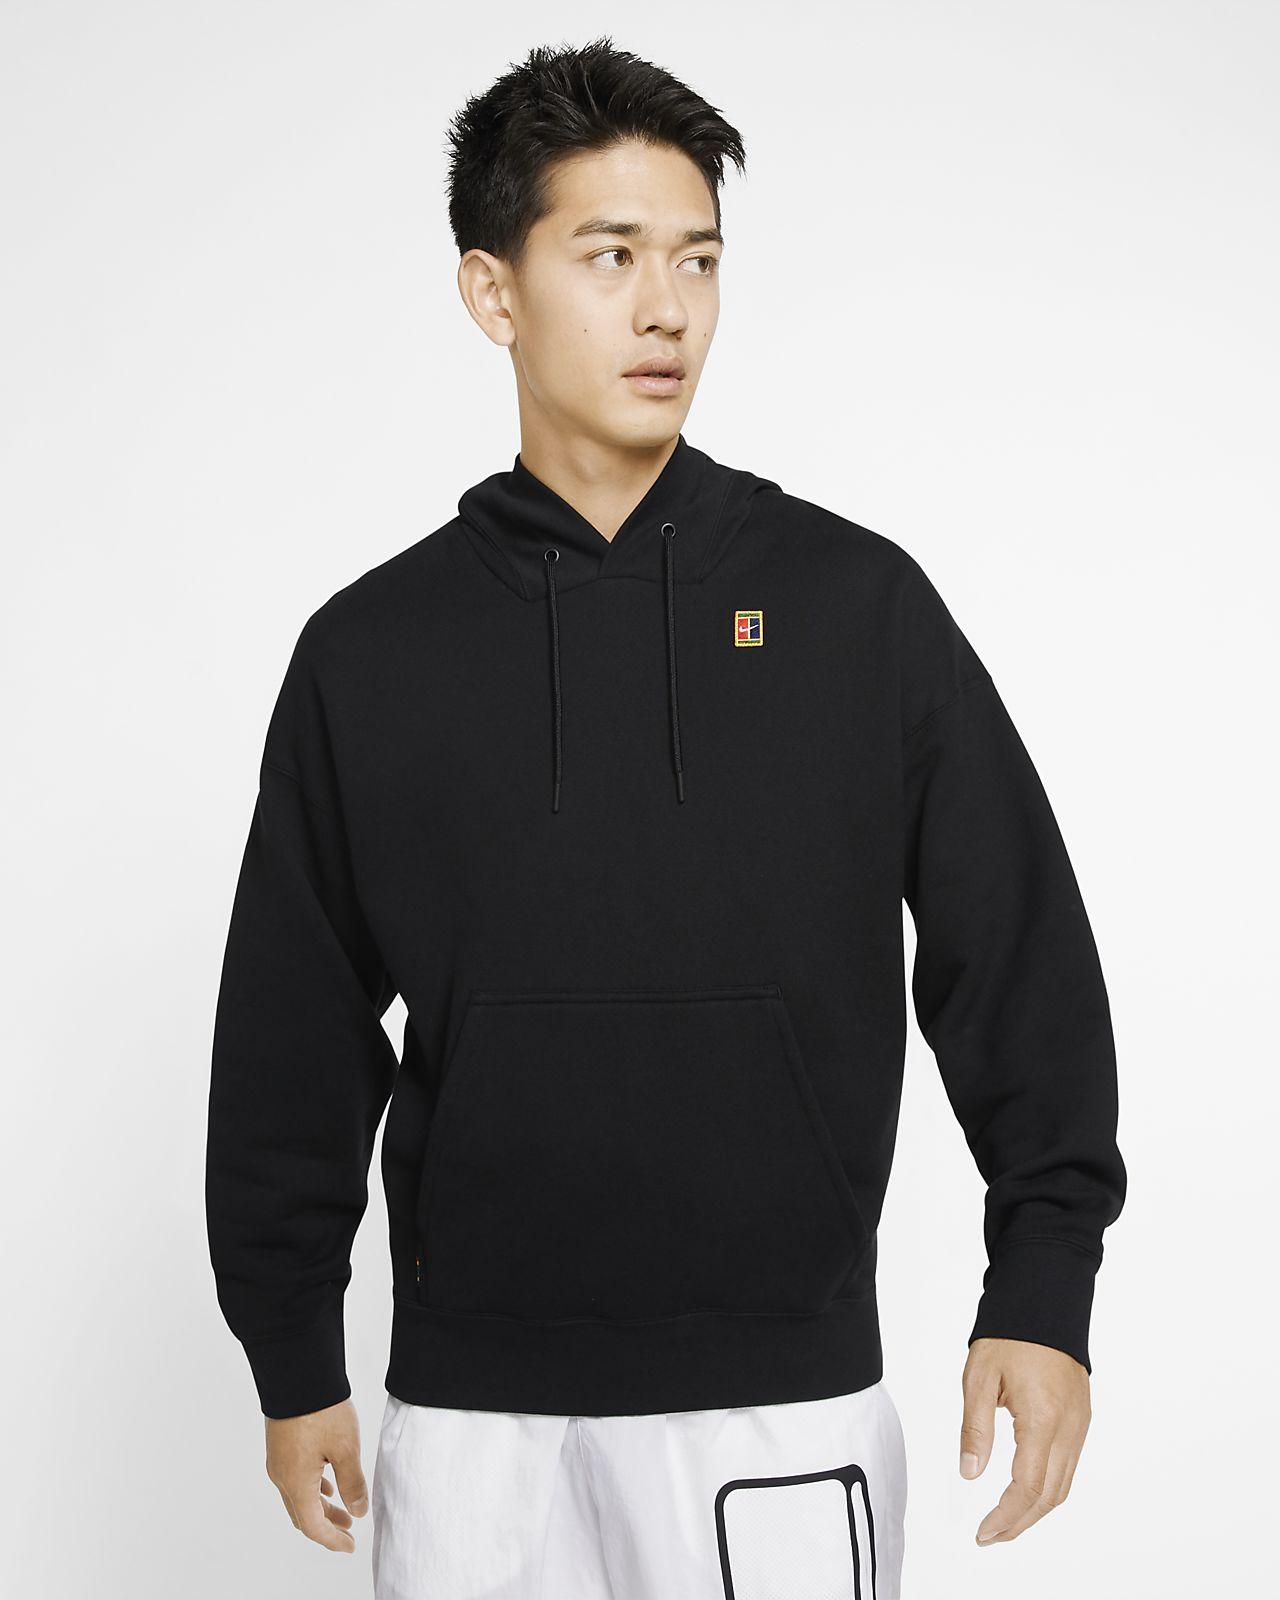 NikeCourt 男子针织网球连帽衫